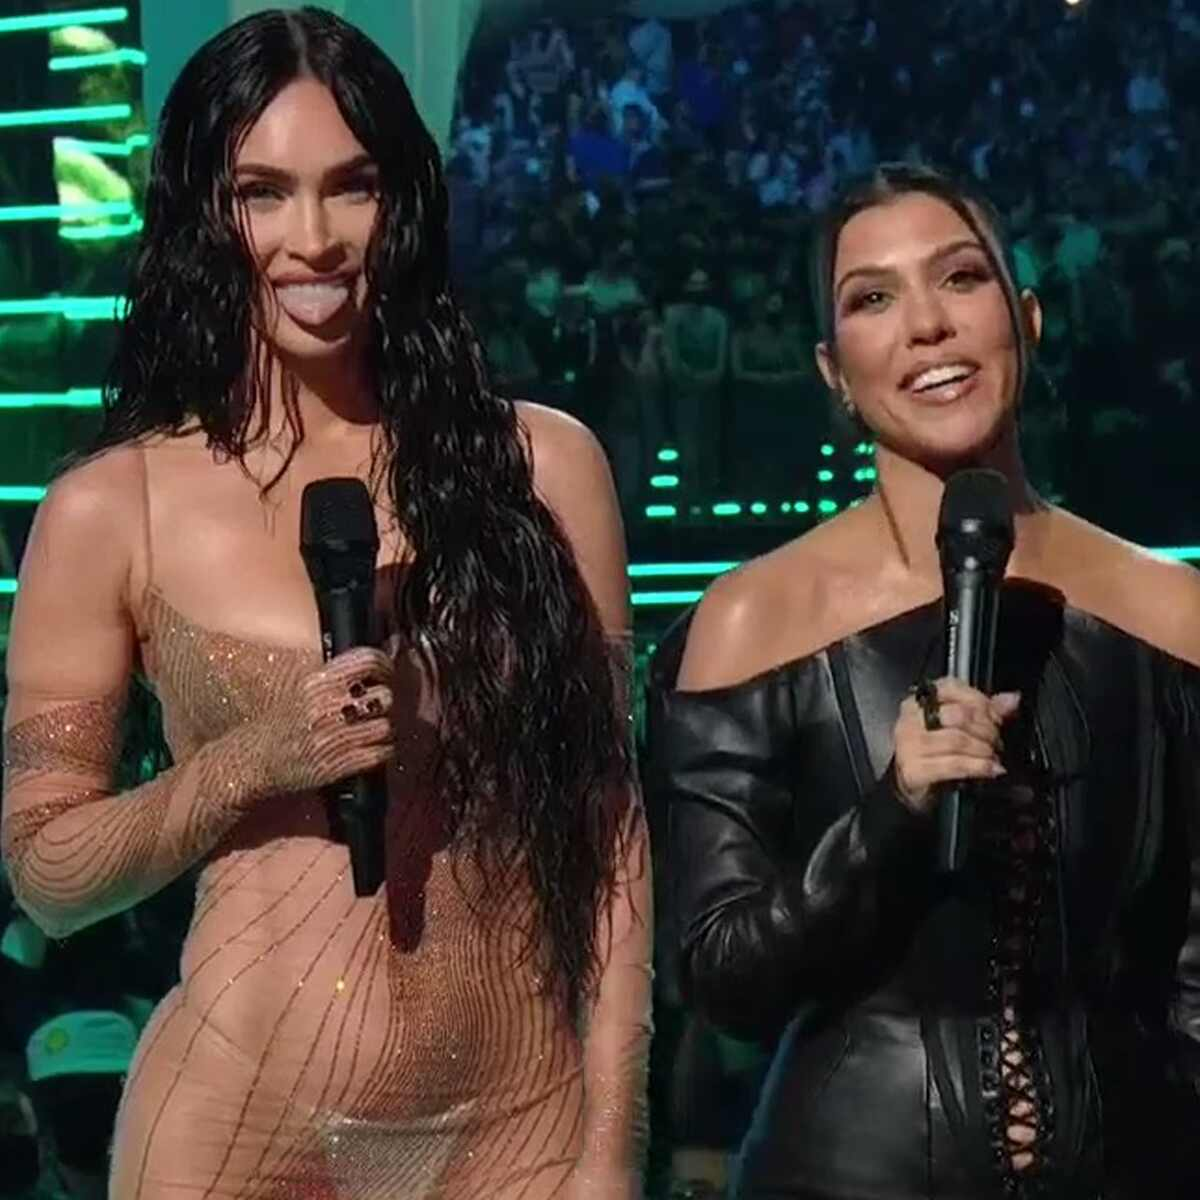 Megan Fox, Kourtney Kardashian, 2021 MTV Video Music Awards, MTV VMA's, Show